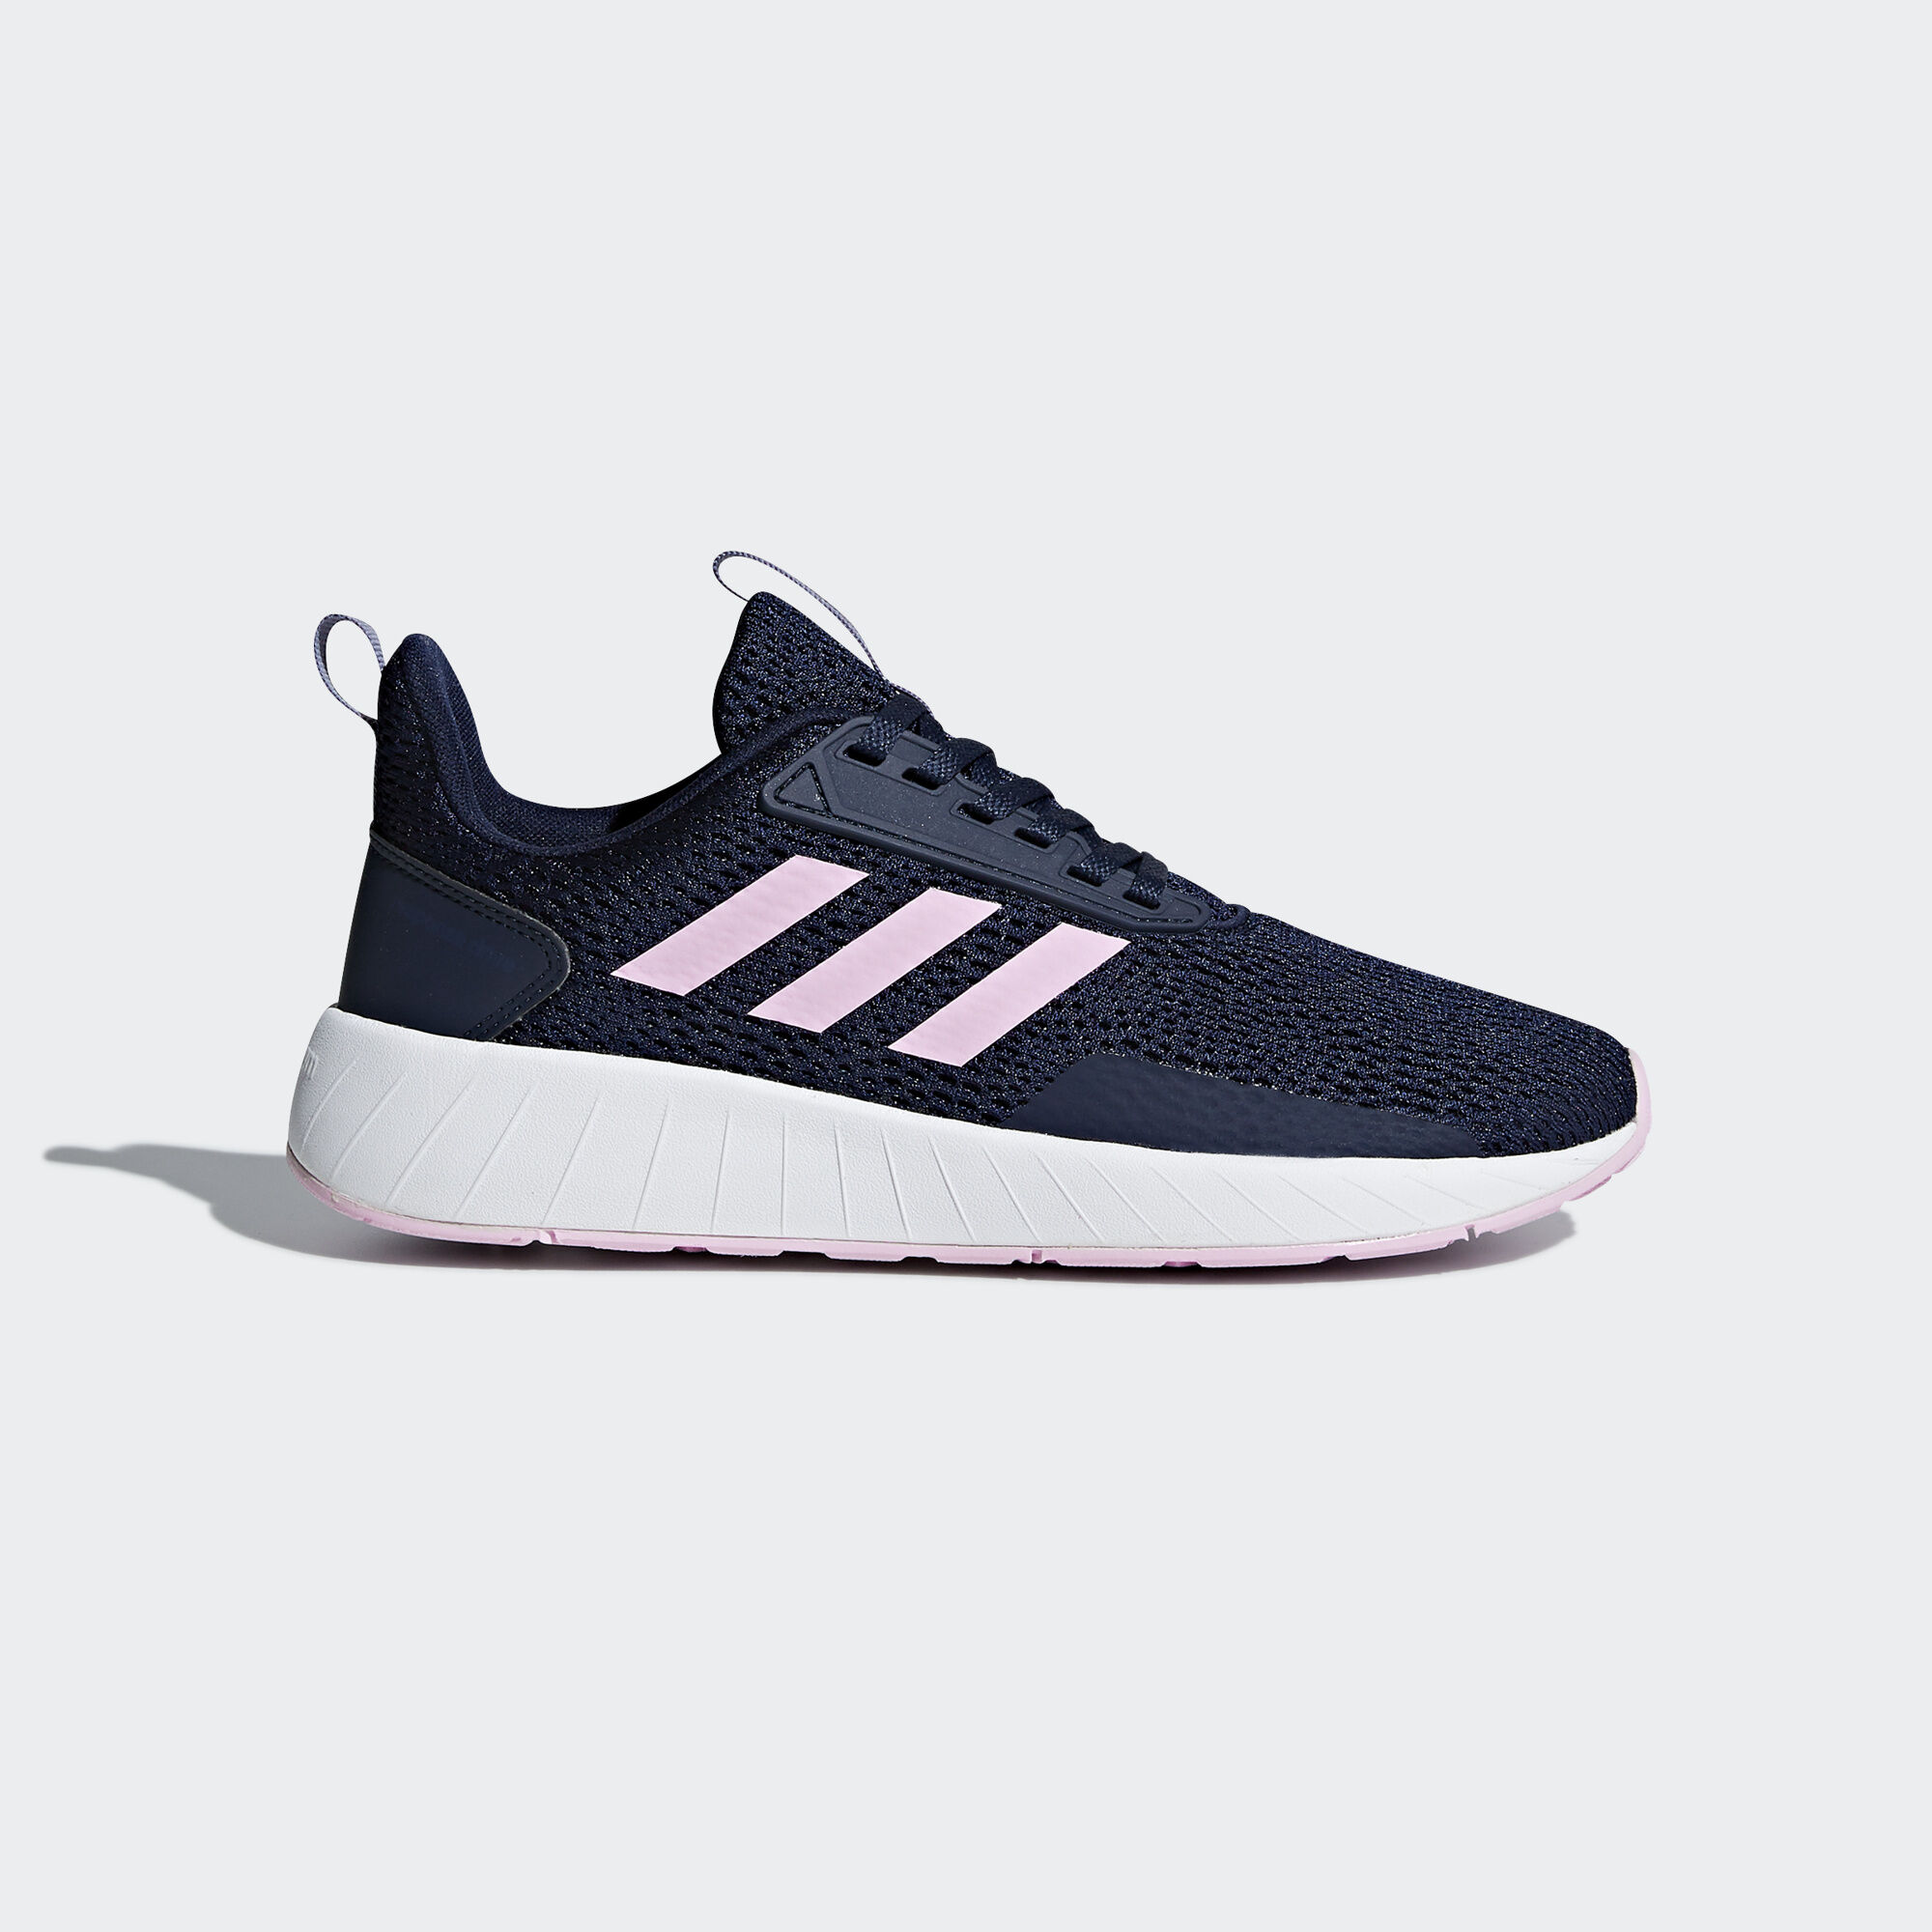 Adidas Stella Mccartney Running Shoes